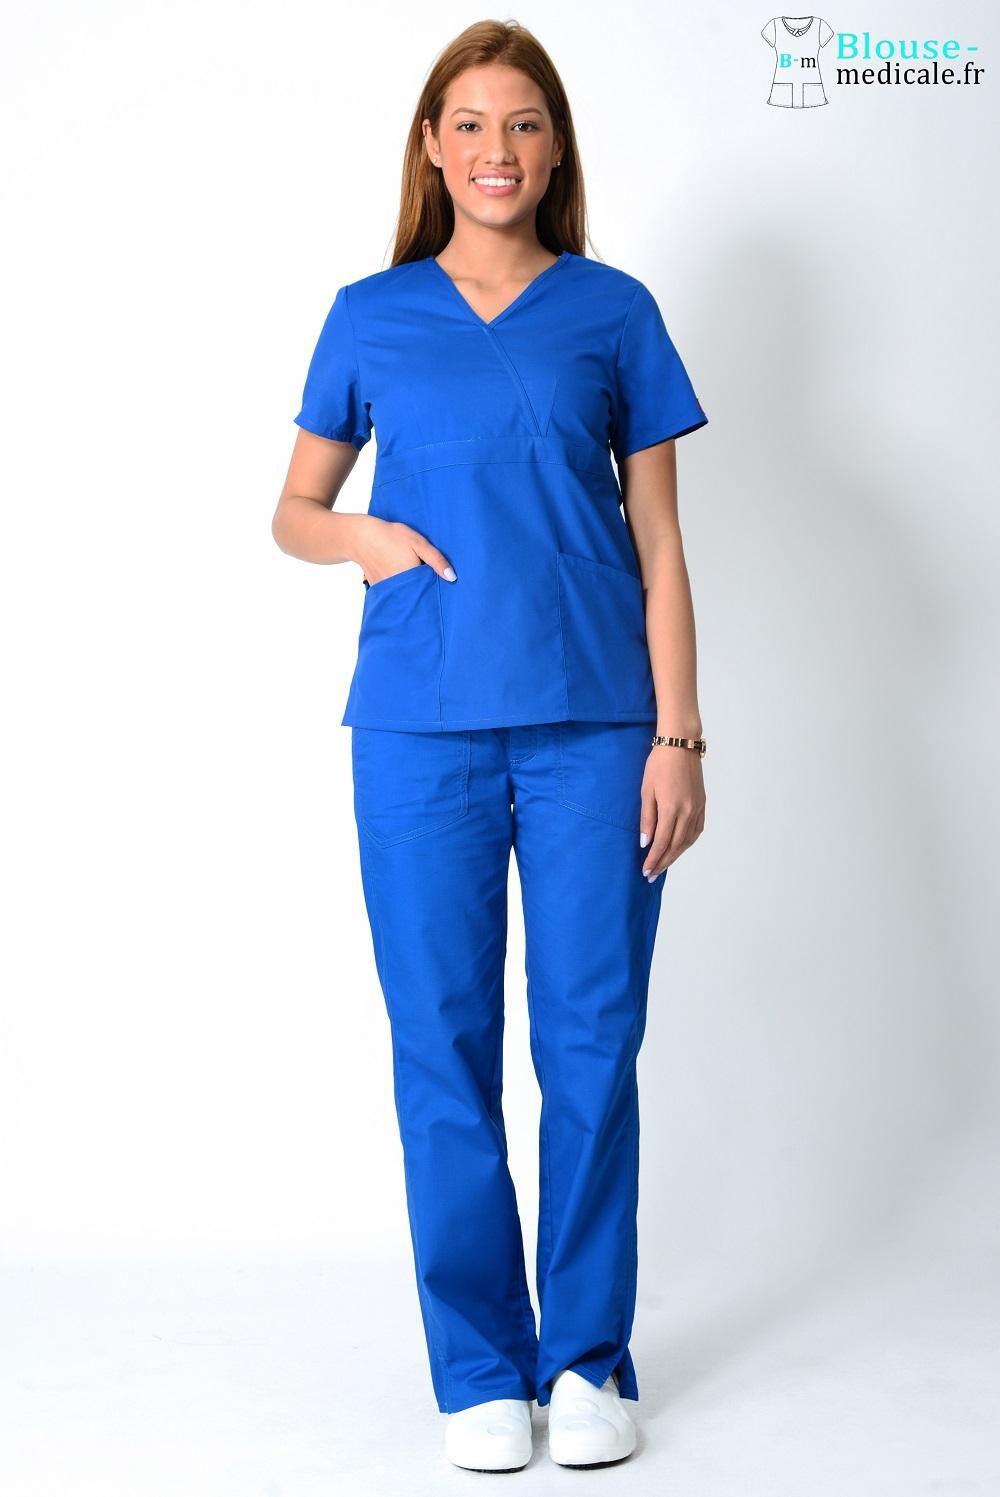 tenue médicale femme dickies pas cher blouse dickies dentiste